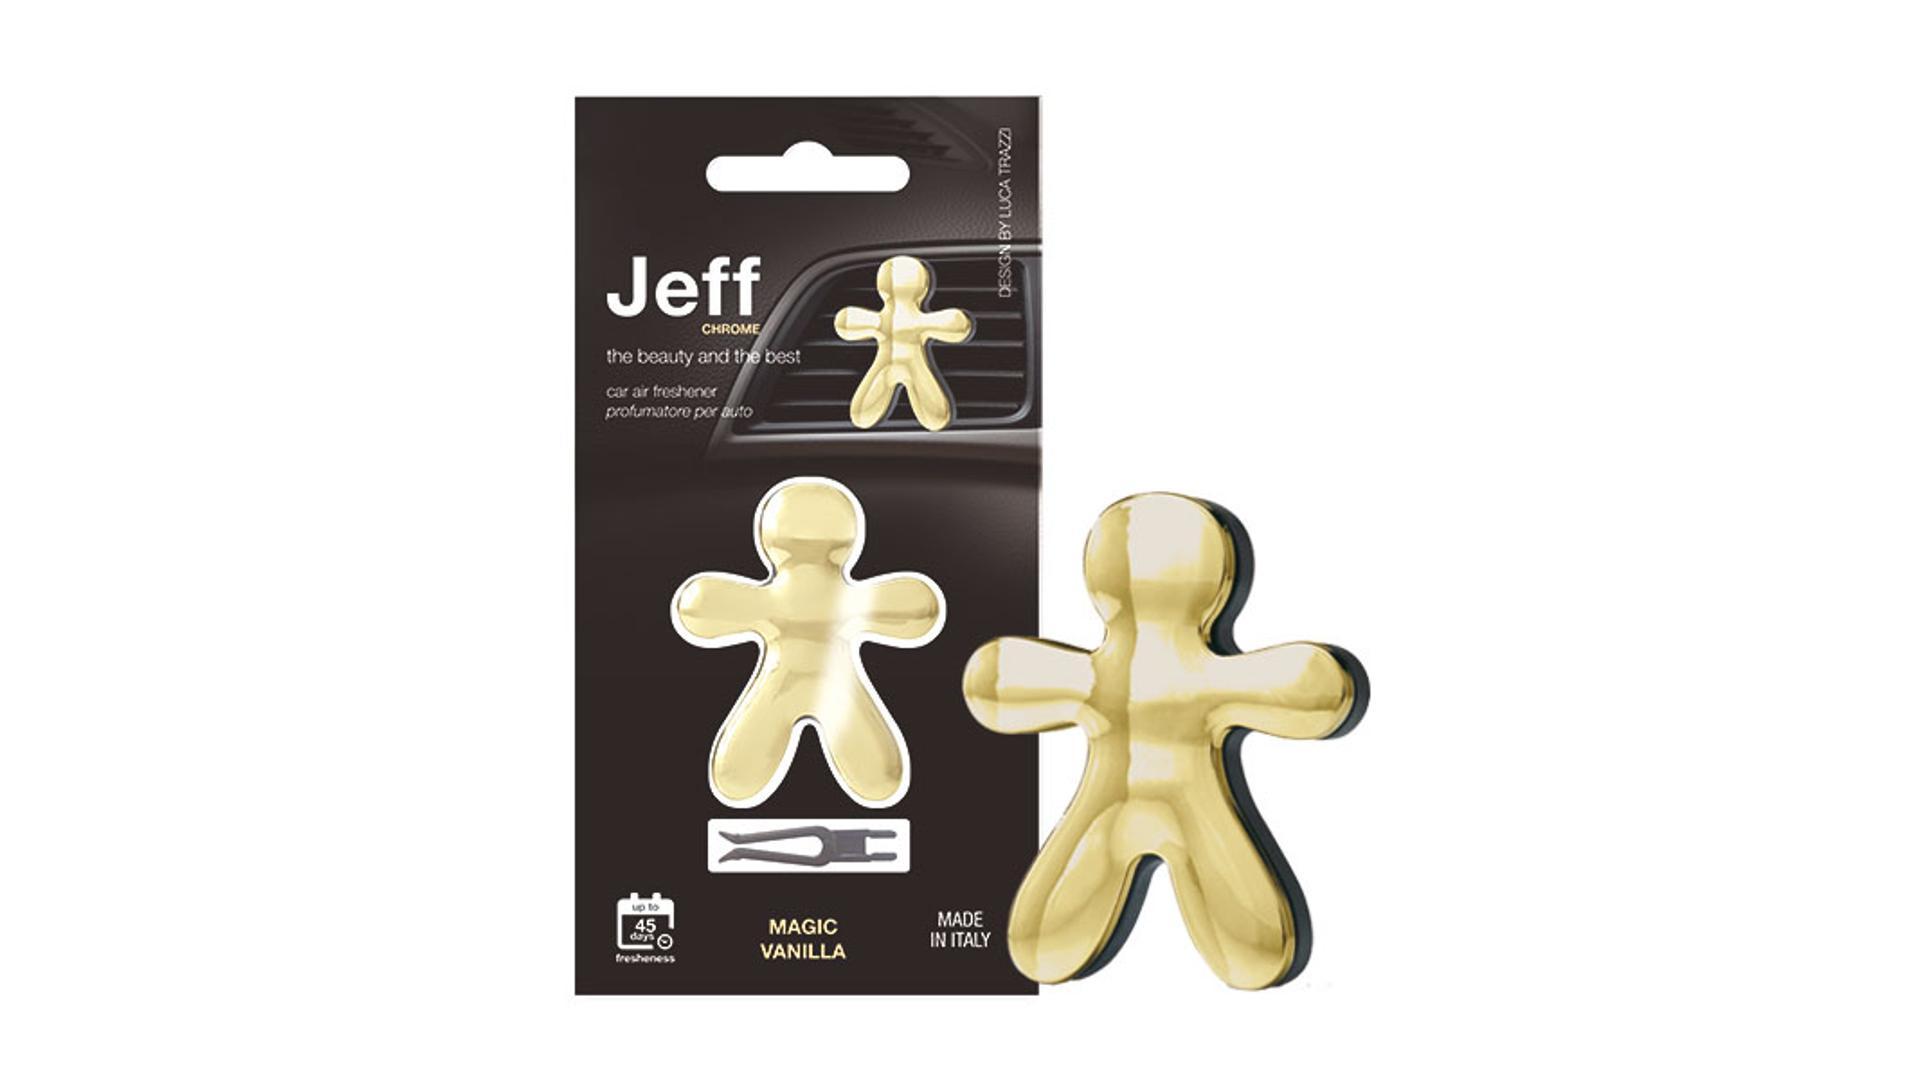 JEFF osviežovač vzduchu zlatý chrome -  Magic Vanilla